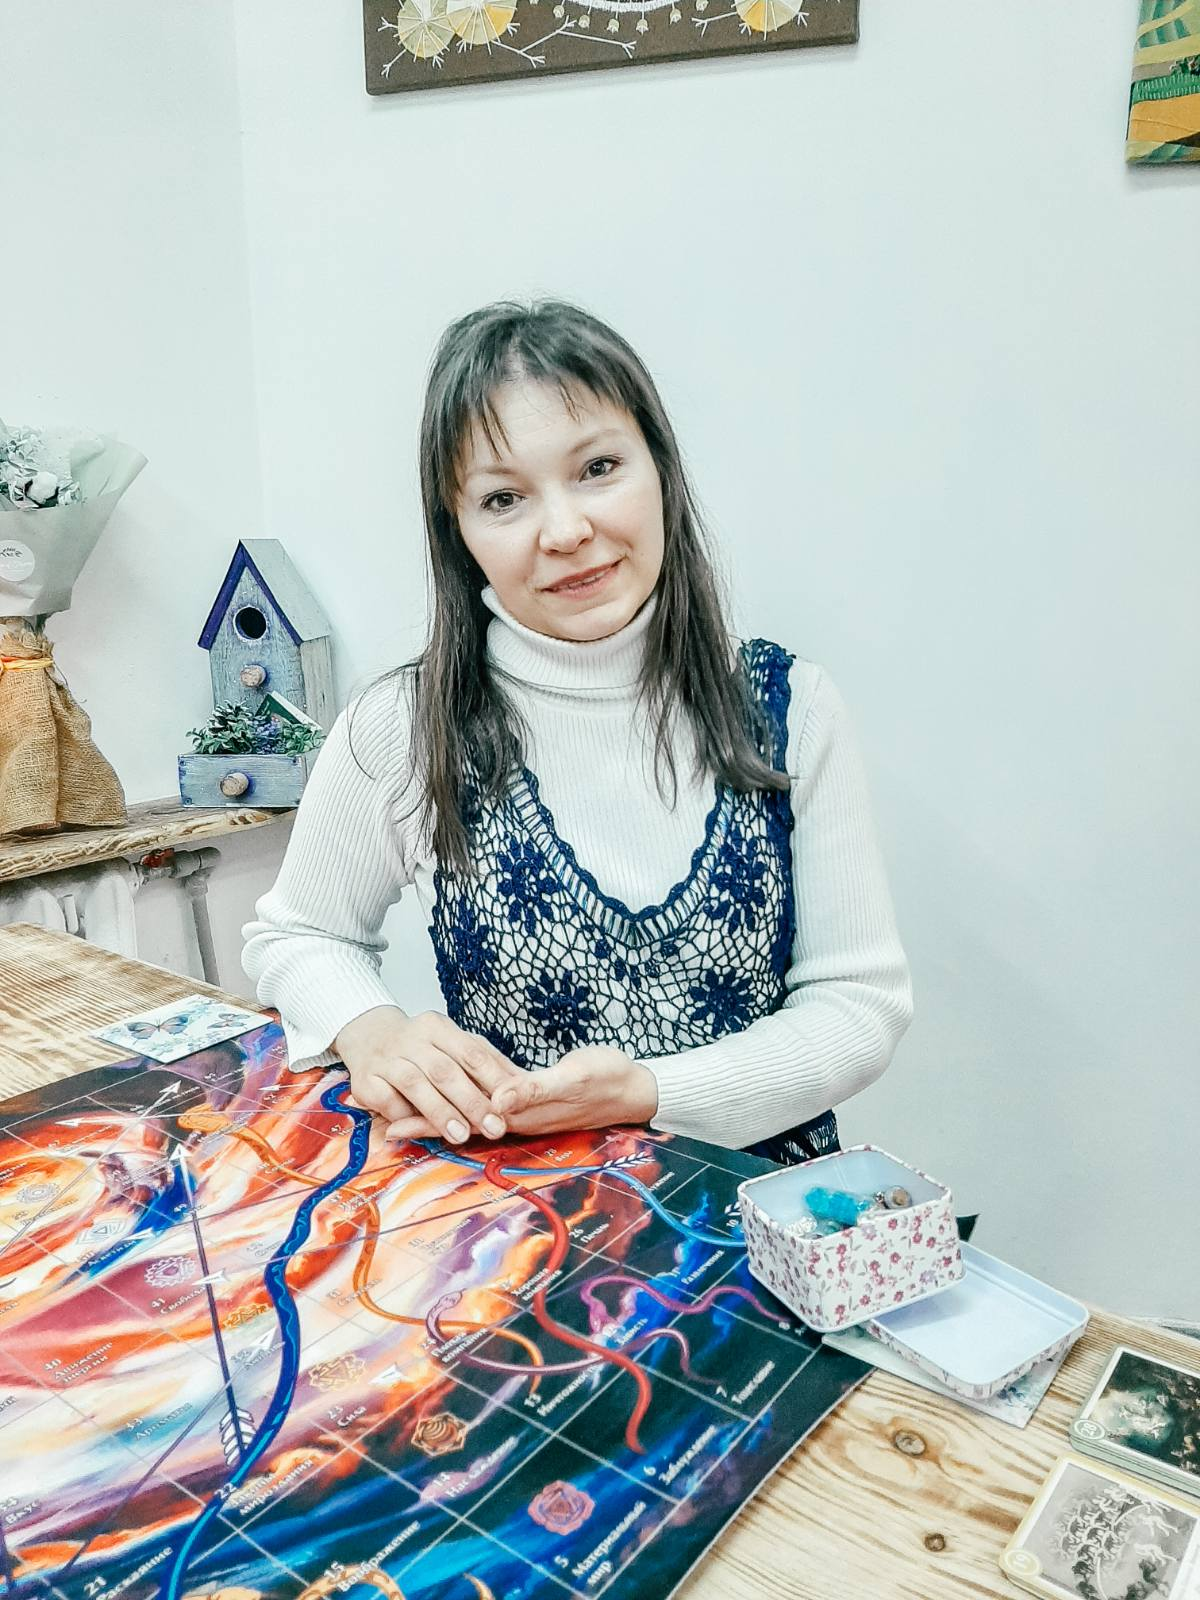 Наталия Ефимченко, 34года, Украина